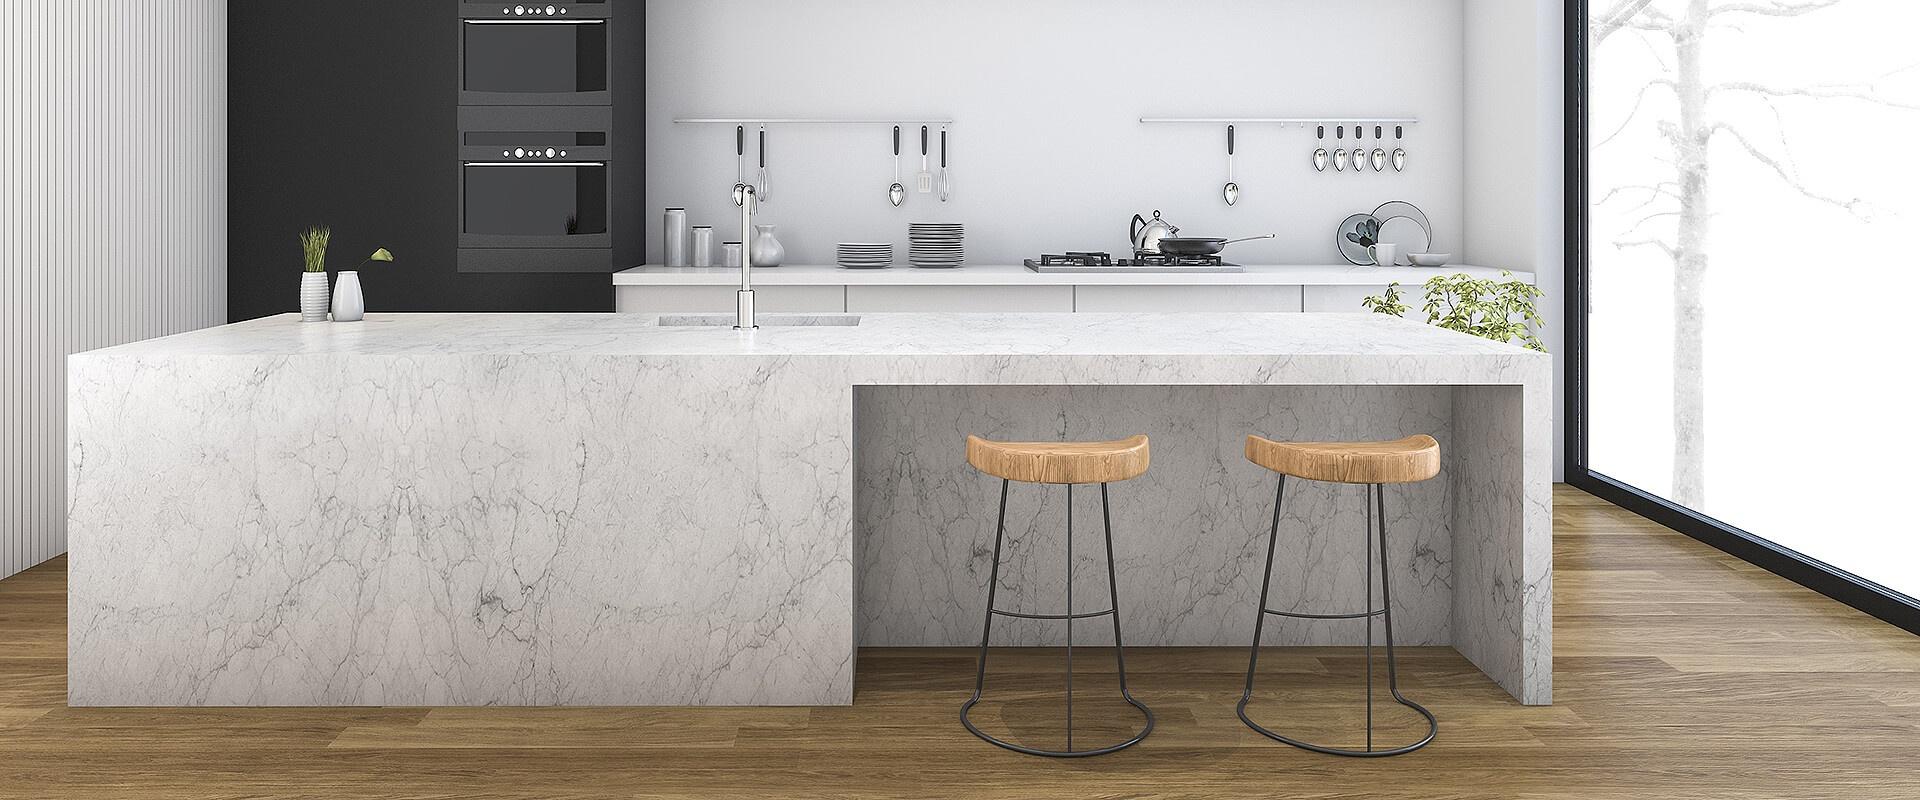 White Marble And Ceramic Modern Minimalist Kitchen Design Idea Ciot